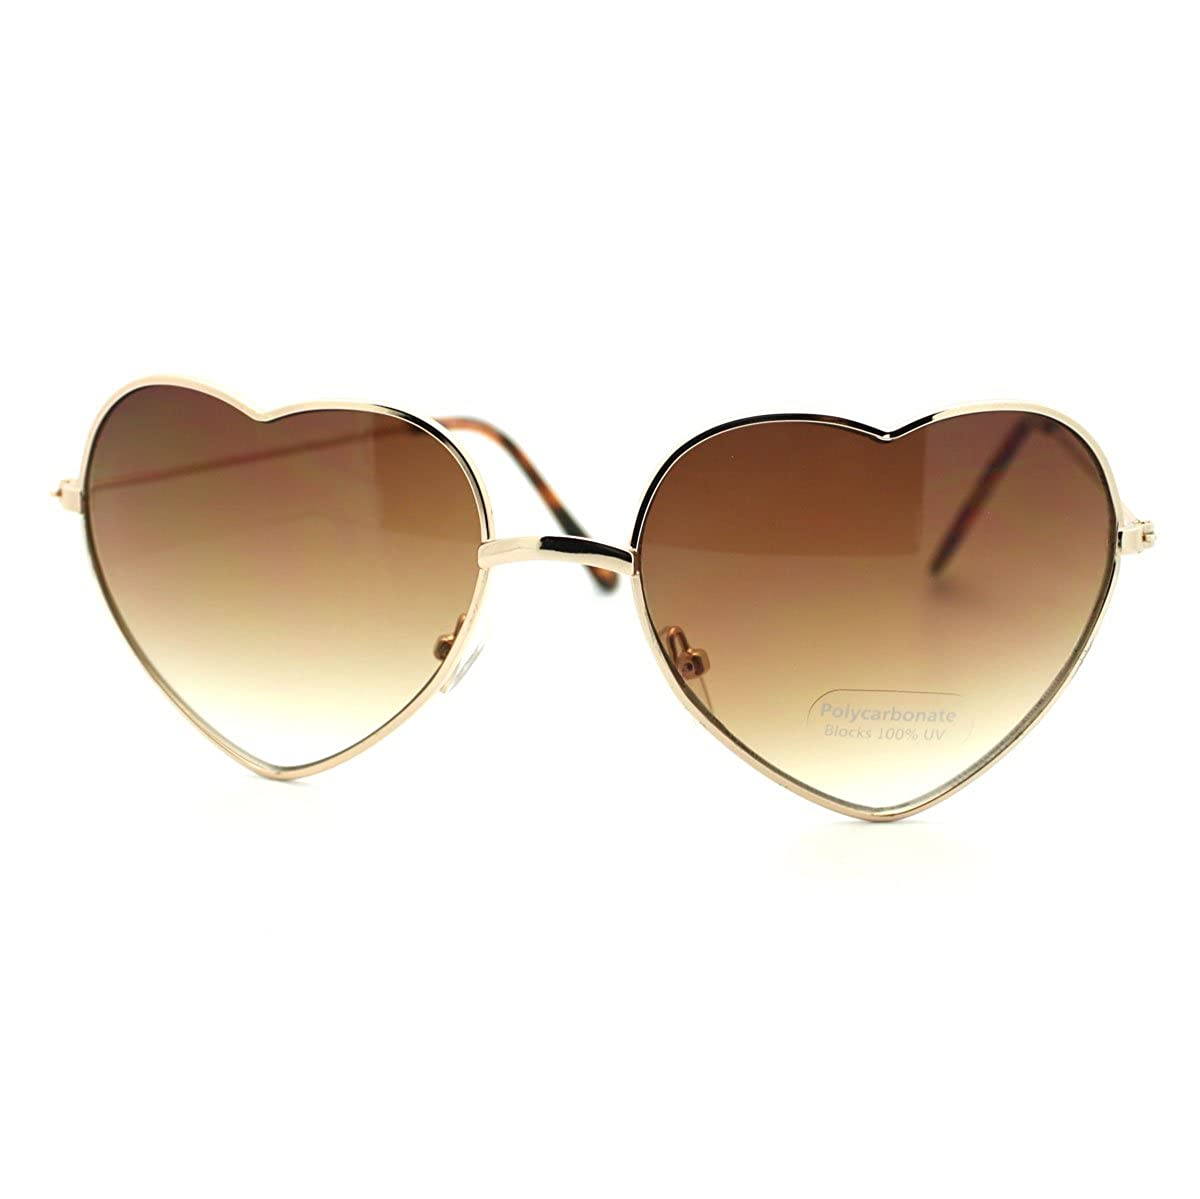 434c7f61ff Amazon.com  Thin Metal Frame Heart Shape Sunglasses Gold Silver  Clothing